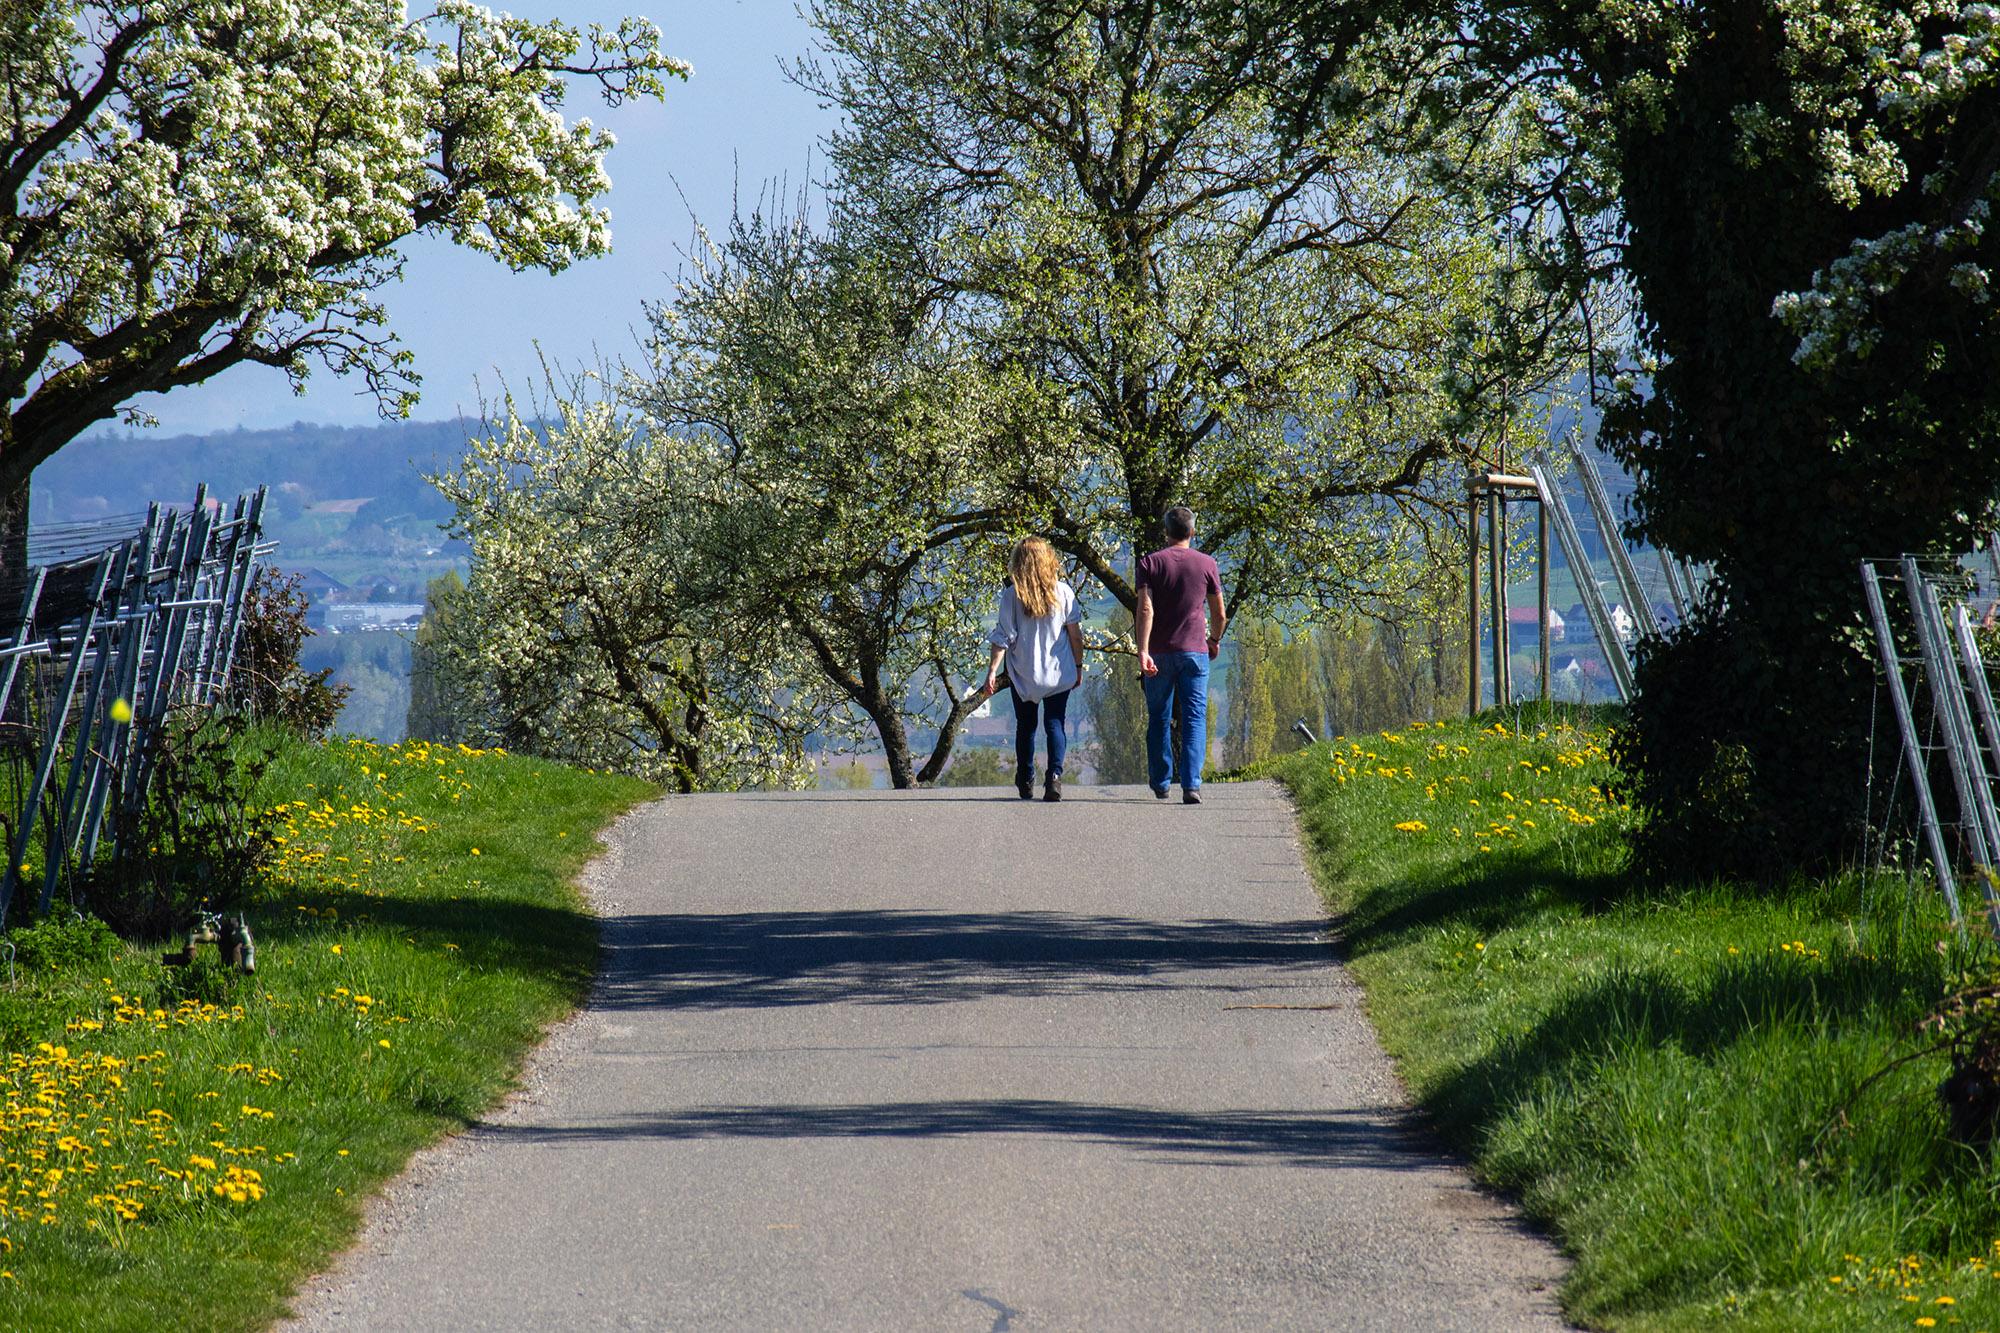 Spaziergänger im Frühjahr